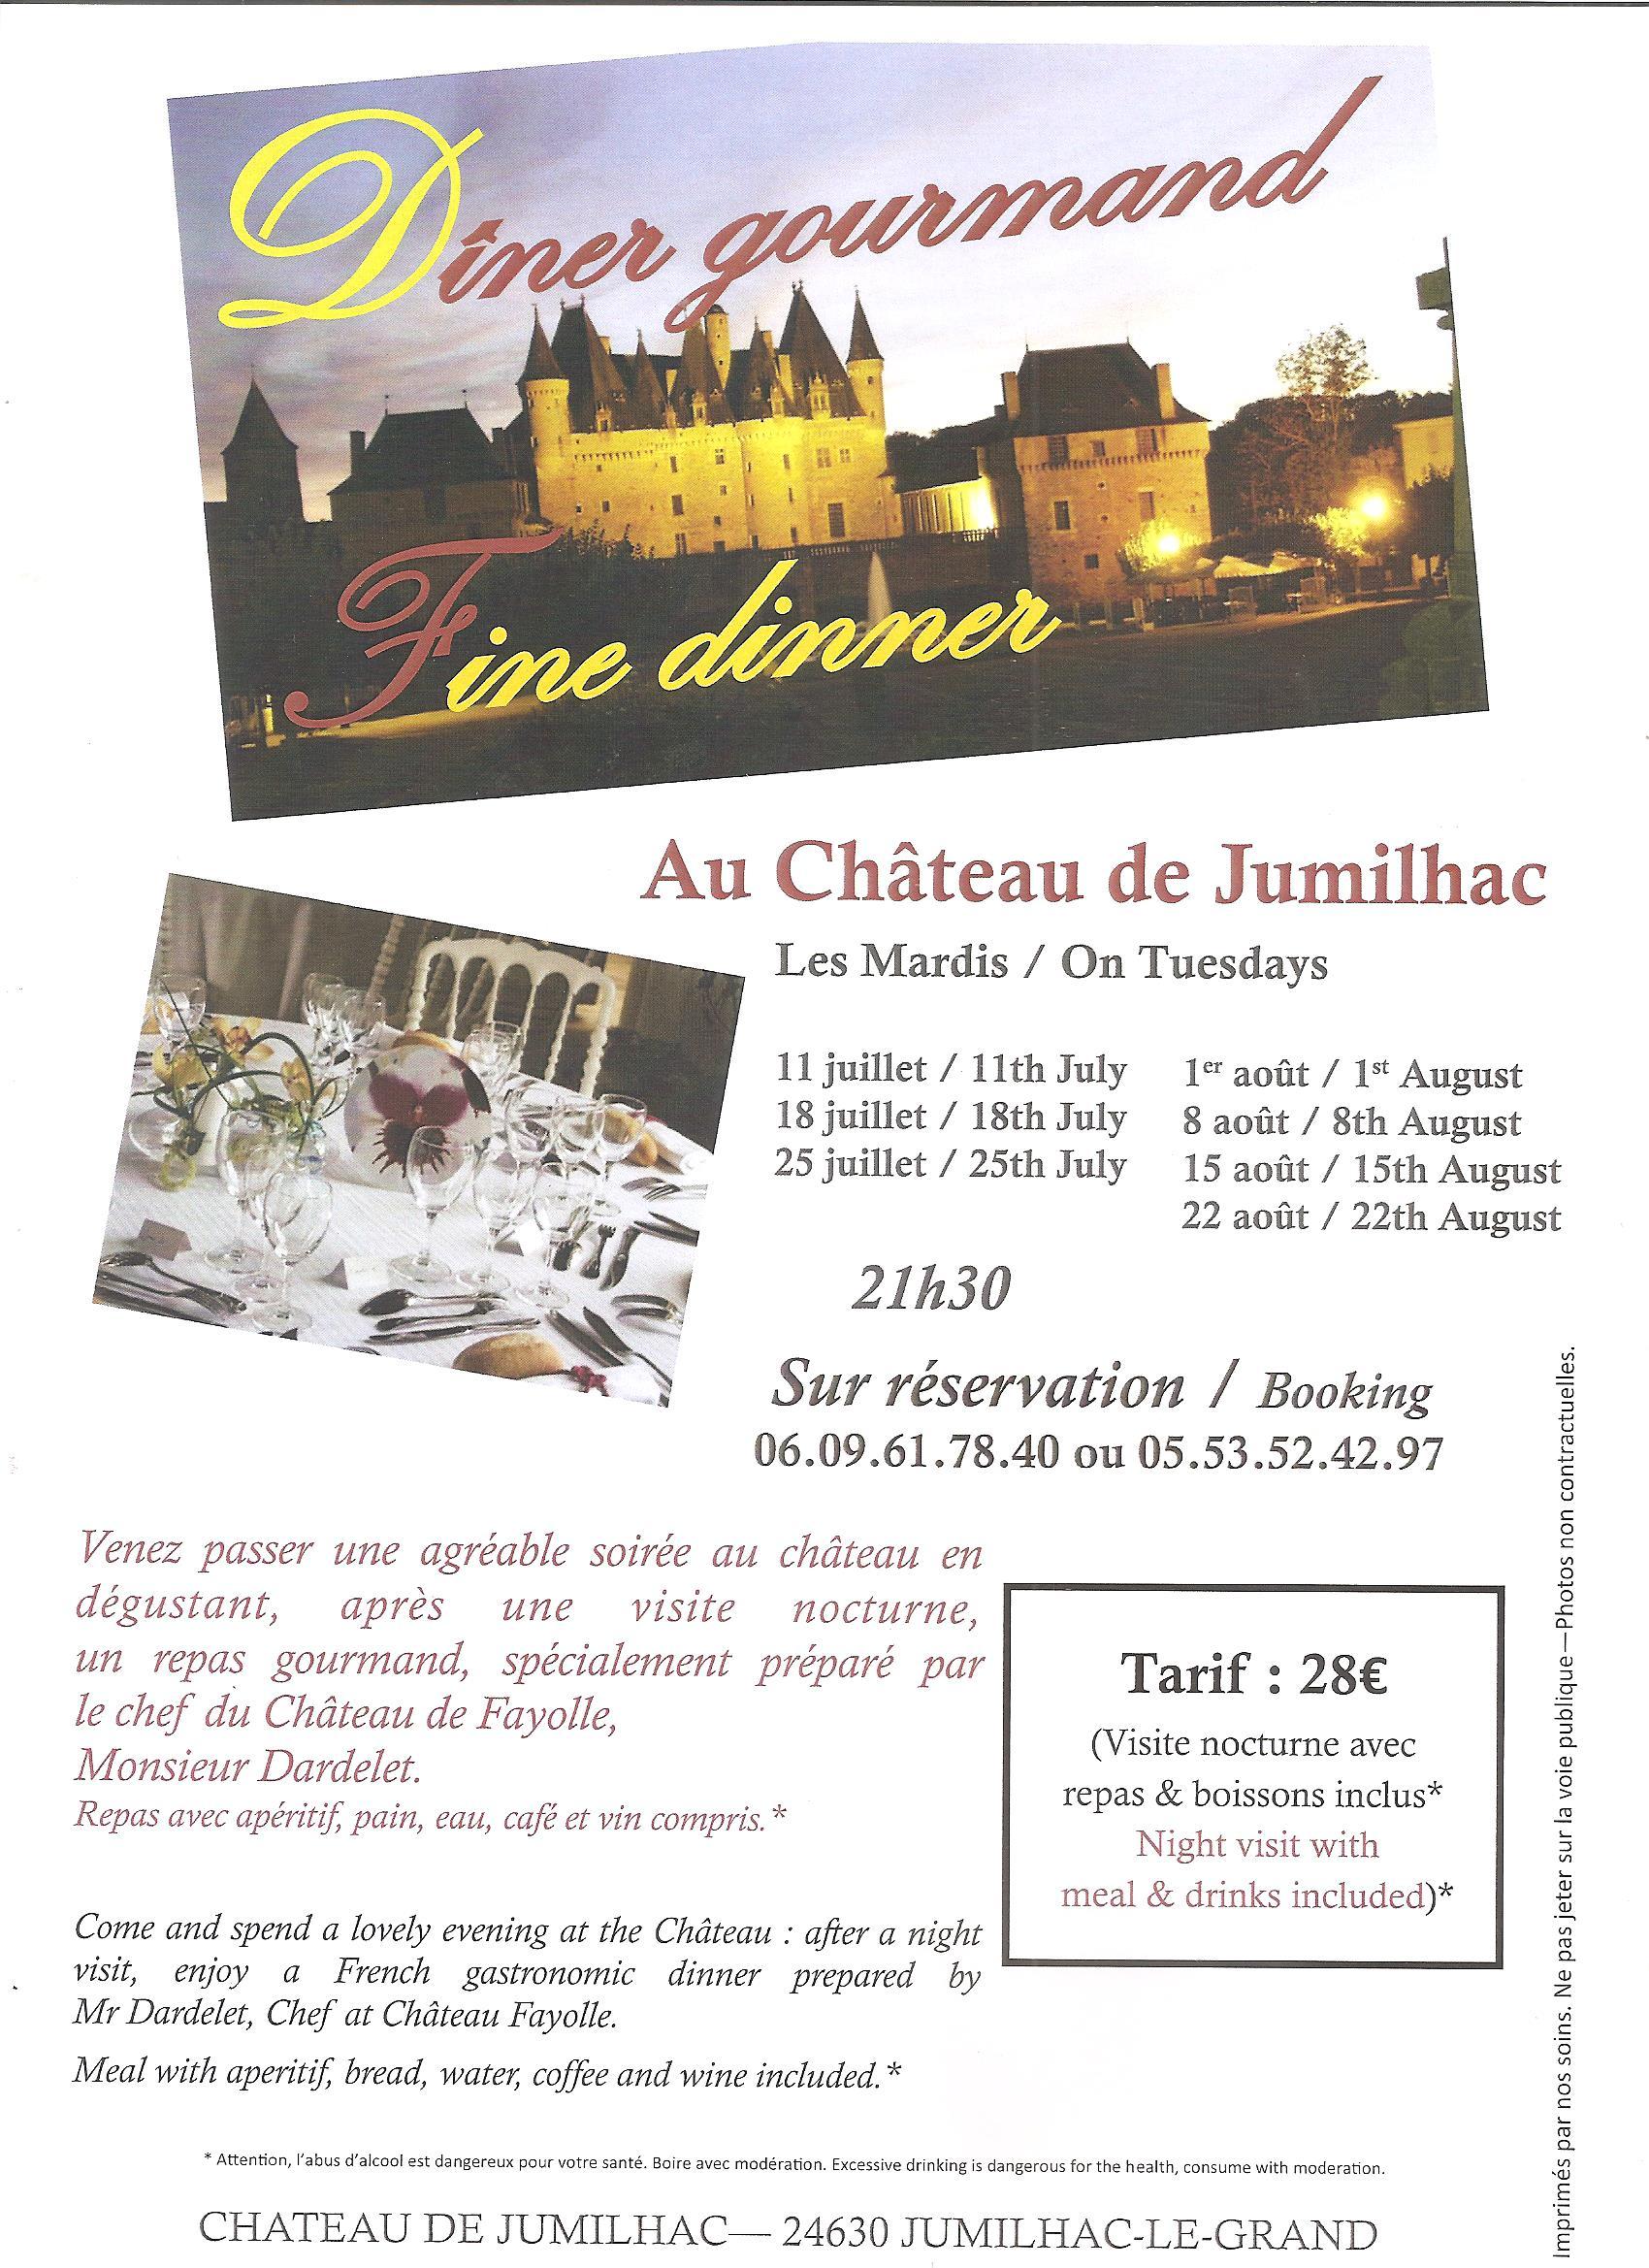 Dîners gourmands au Château